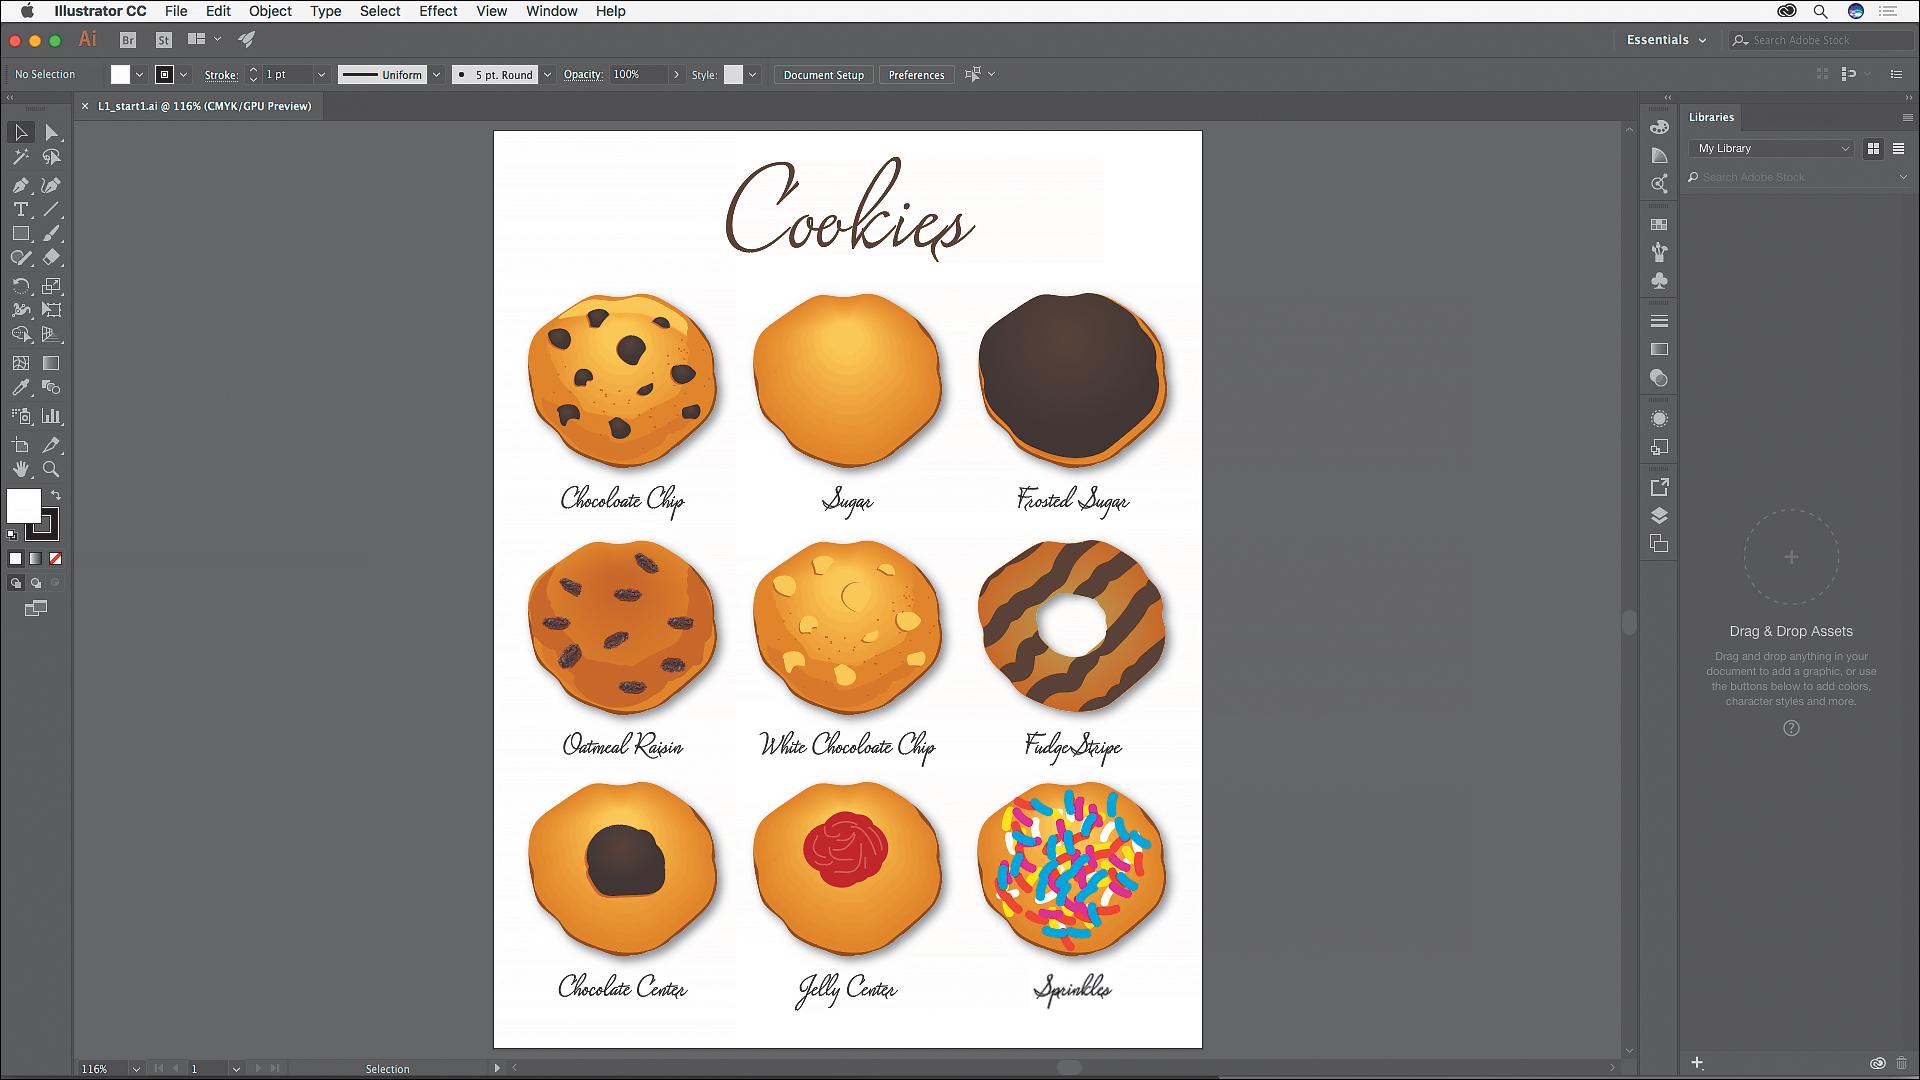 Adobe Illustrator CC windows